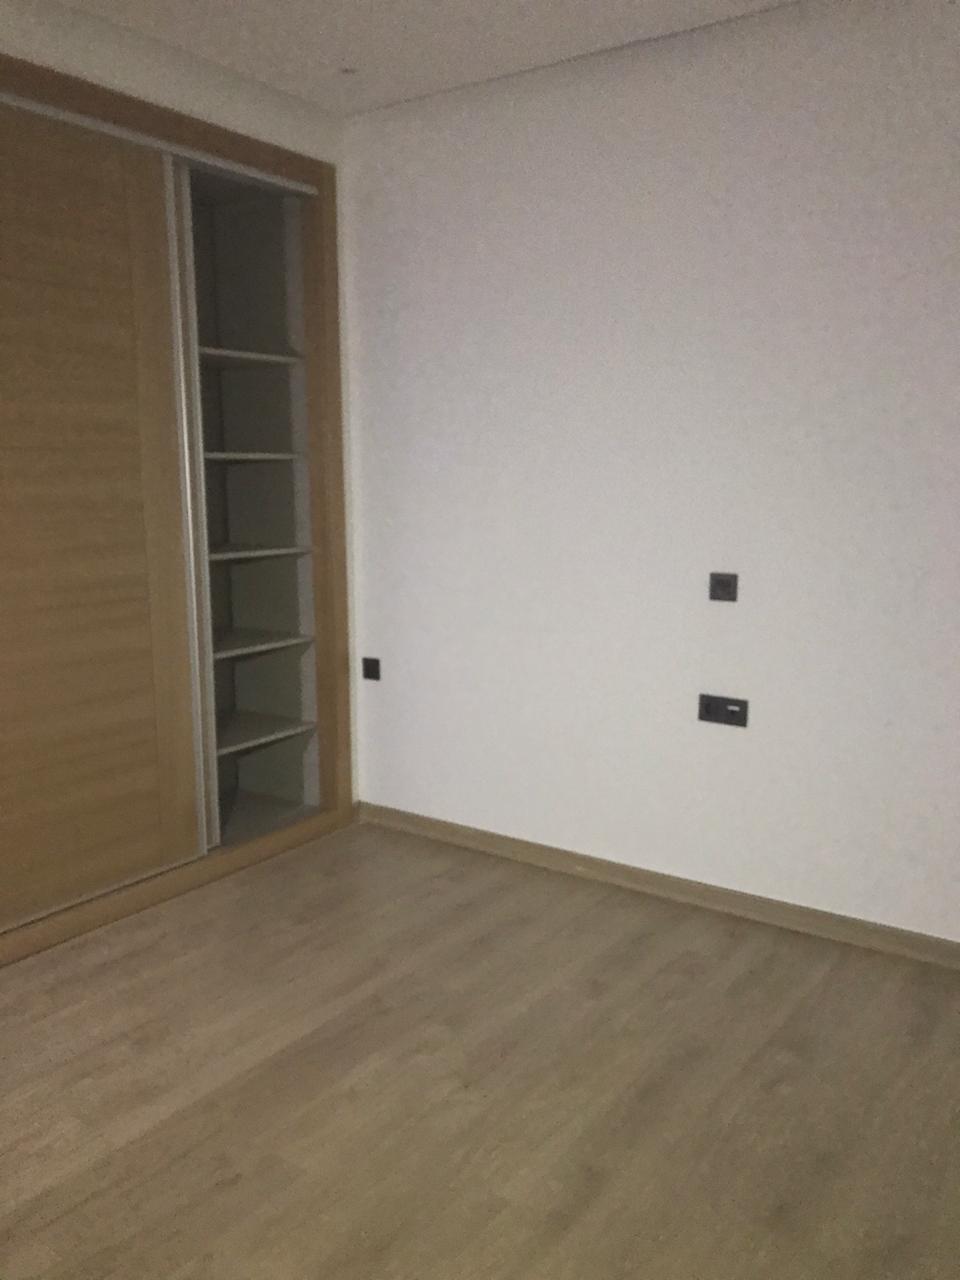 Location appartement vide à Sonaba